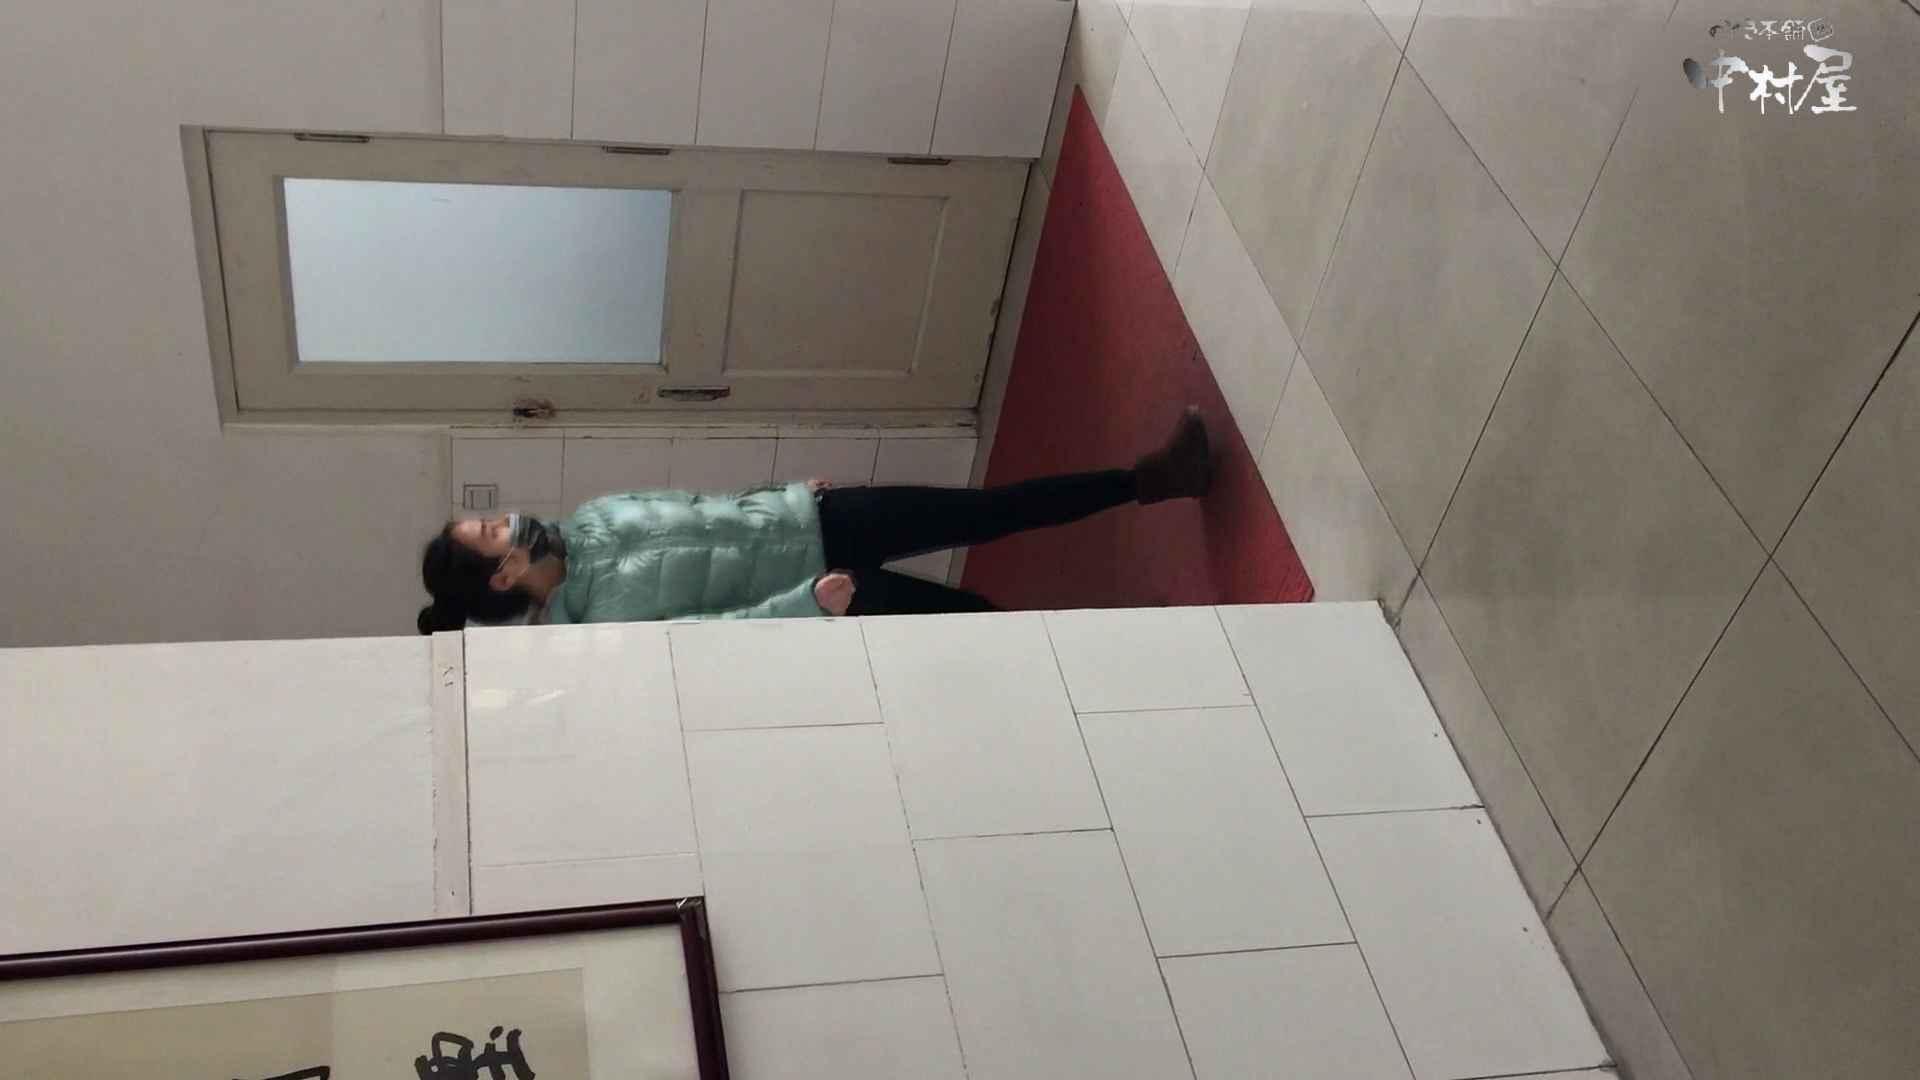 GOD HAND 芸術大学盗撮‼vol.94 盗撮師作品 セックス無修正動画無料 104pic 102